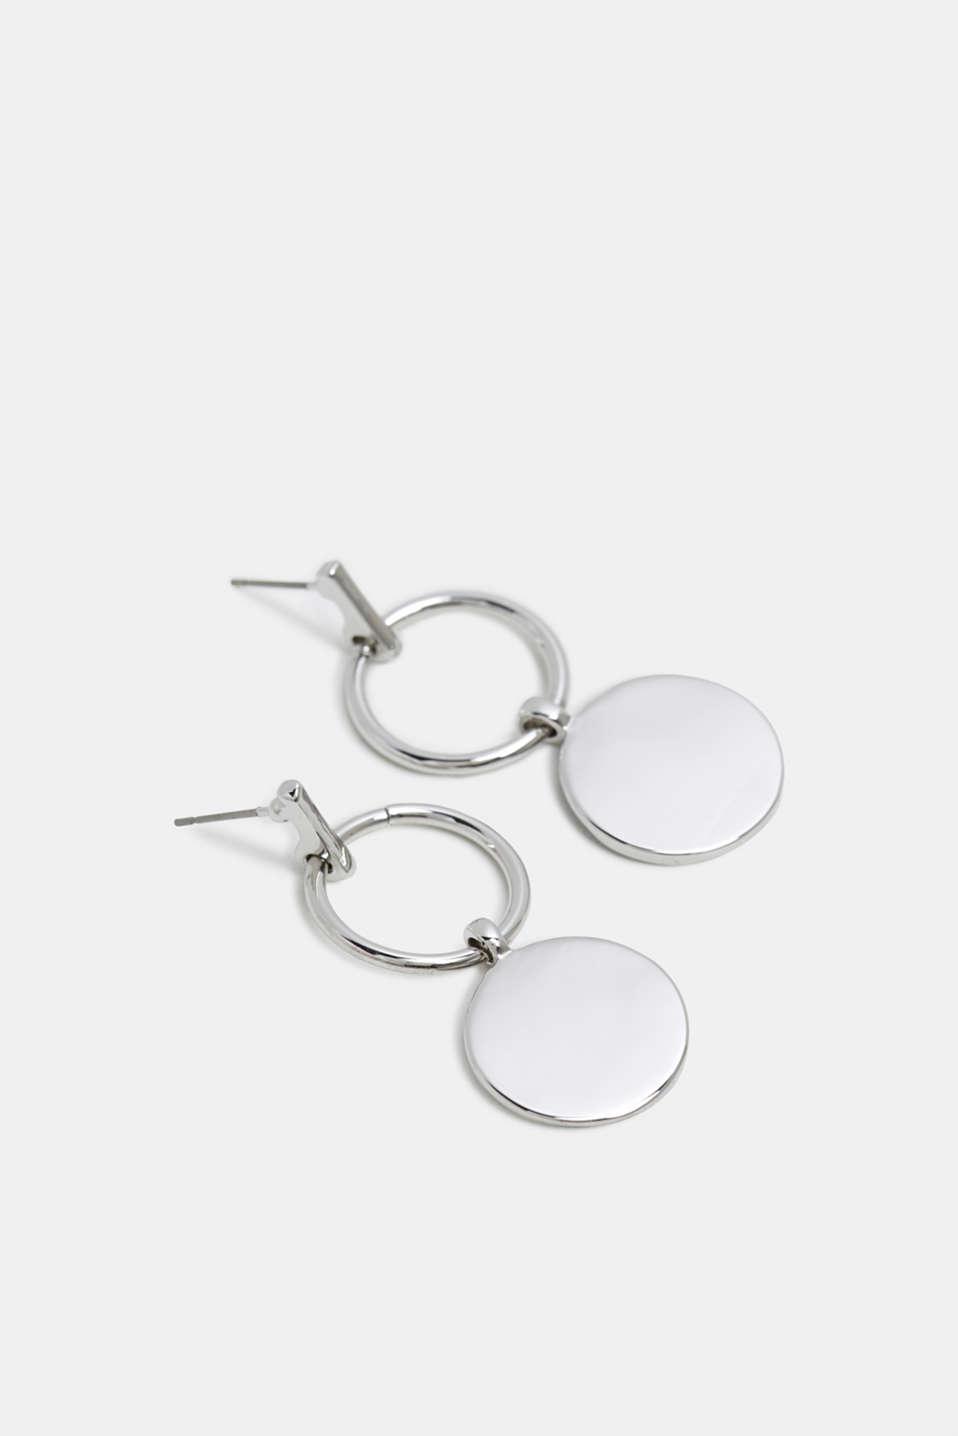 Stud earrings with metal discs, SILVER, detail image number 1